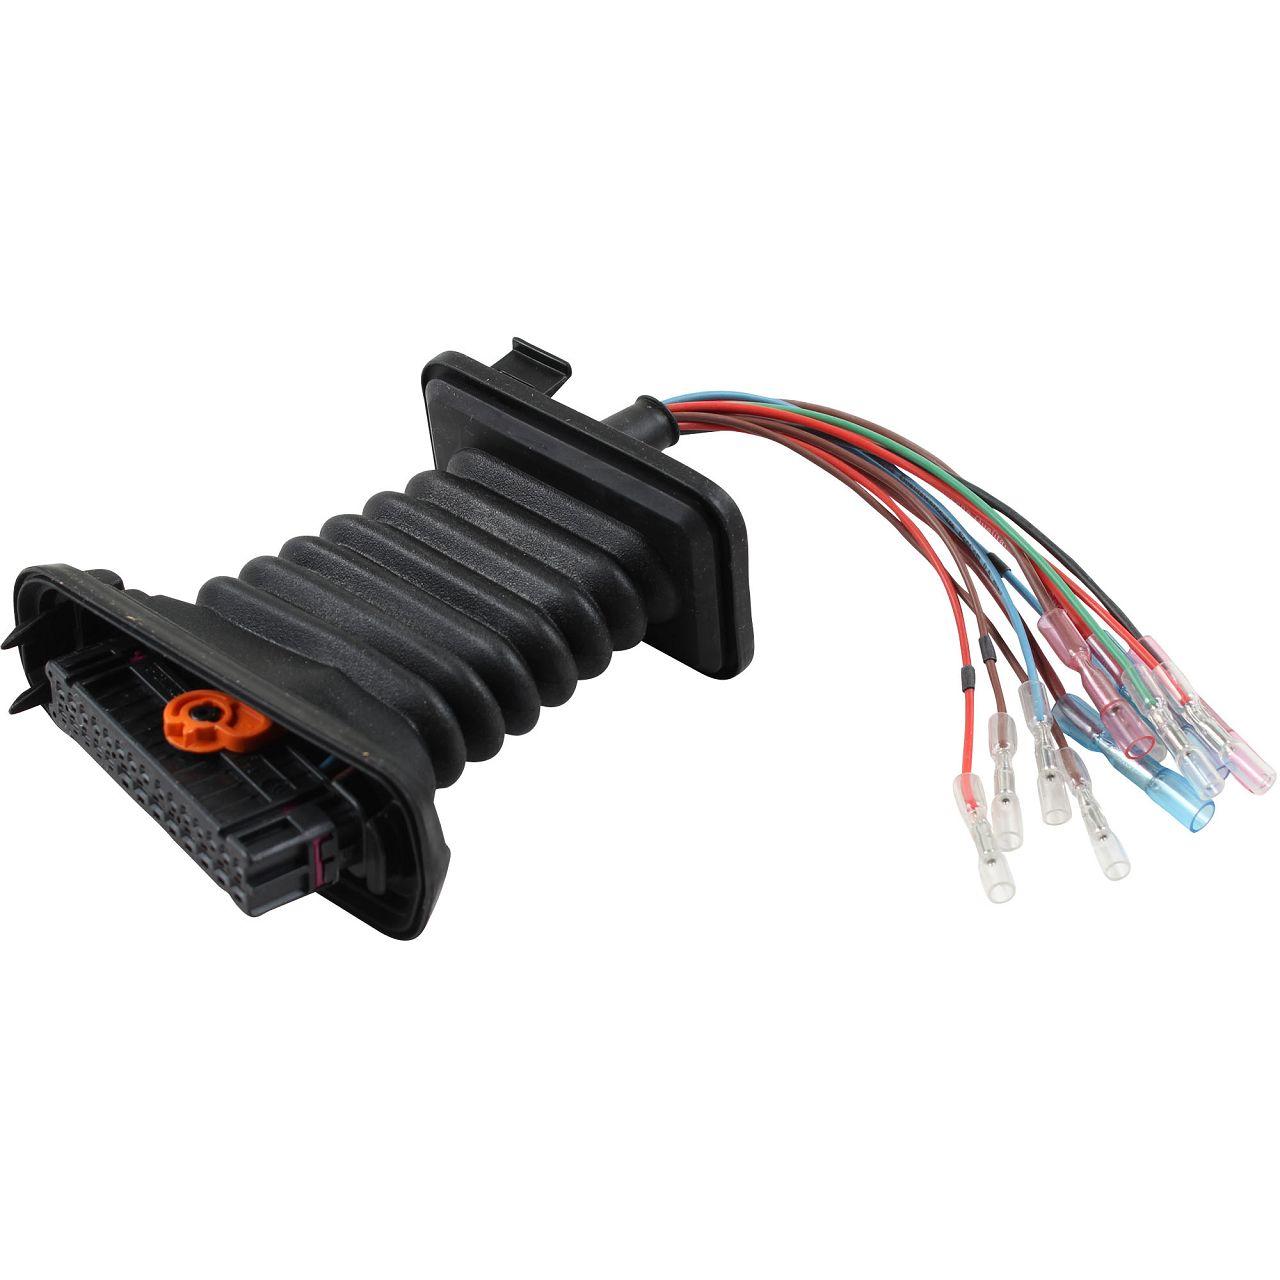 SENCOM Kabelbaum Kabelsatz Fahrzeugtür Tür VW Beetle (5C) Golf 5 (1K) vorne / hinten